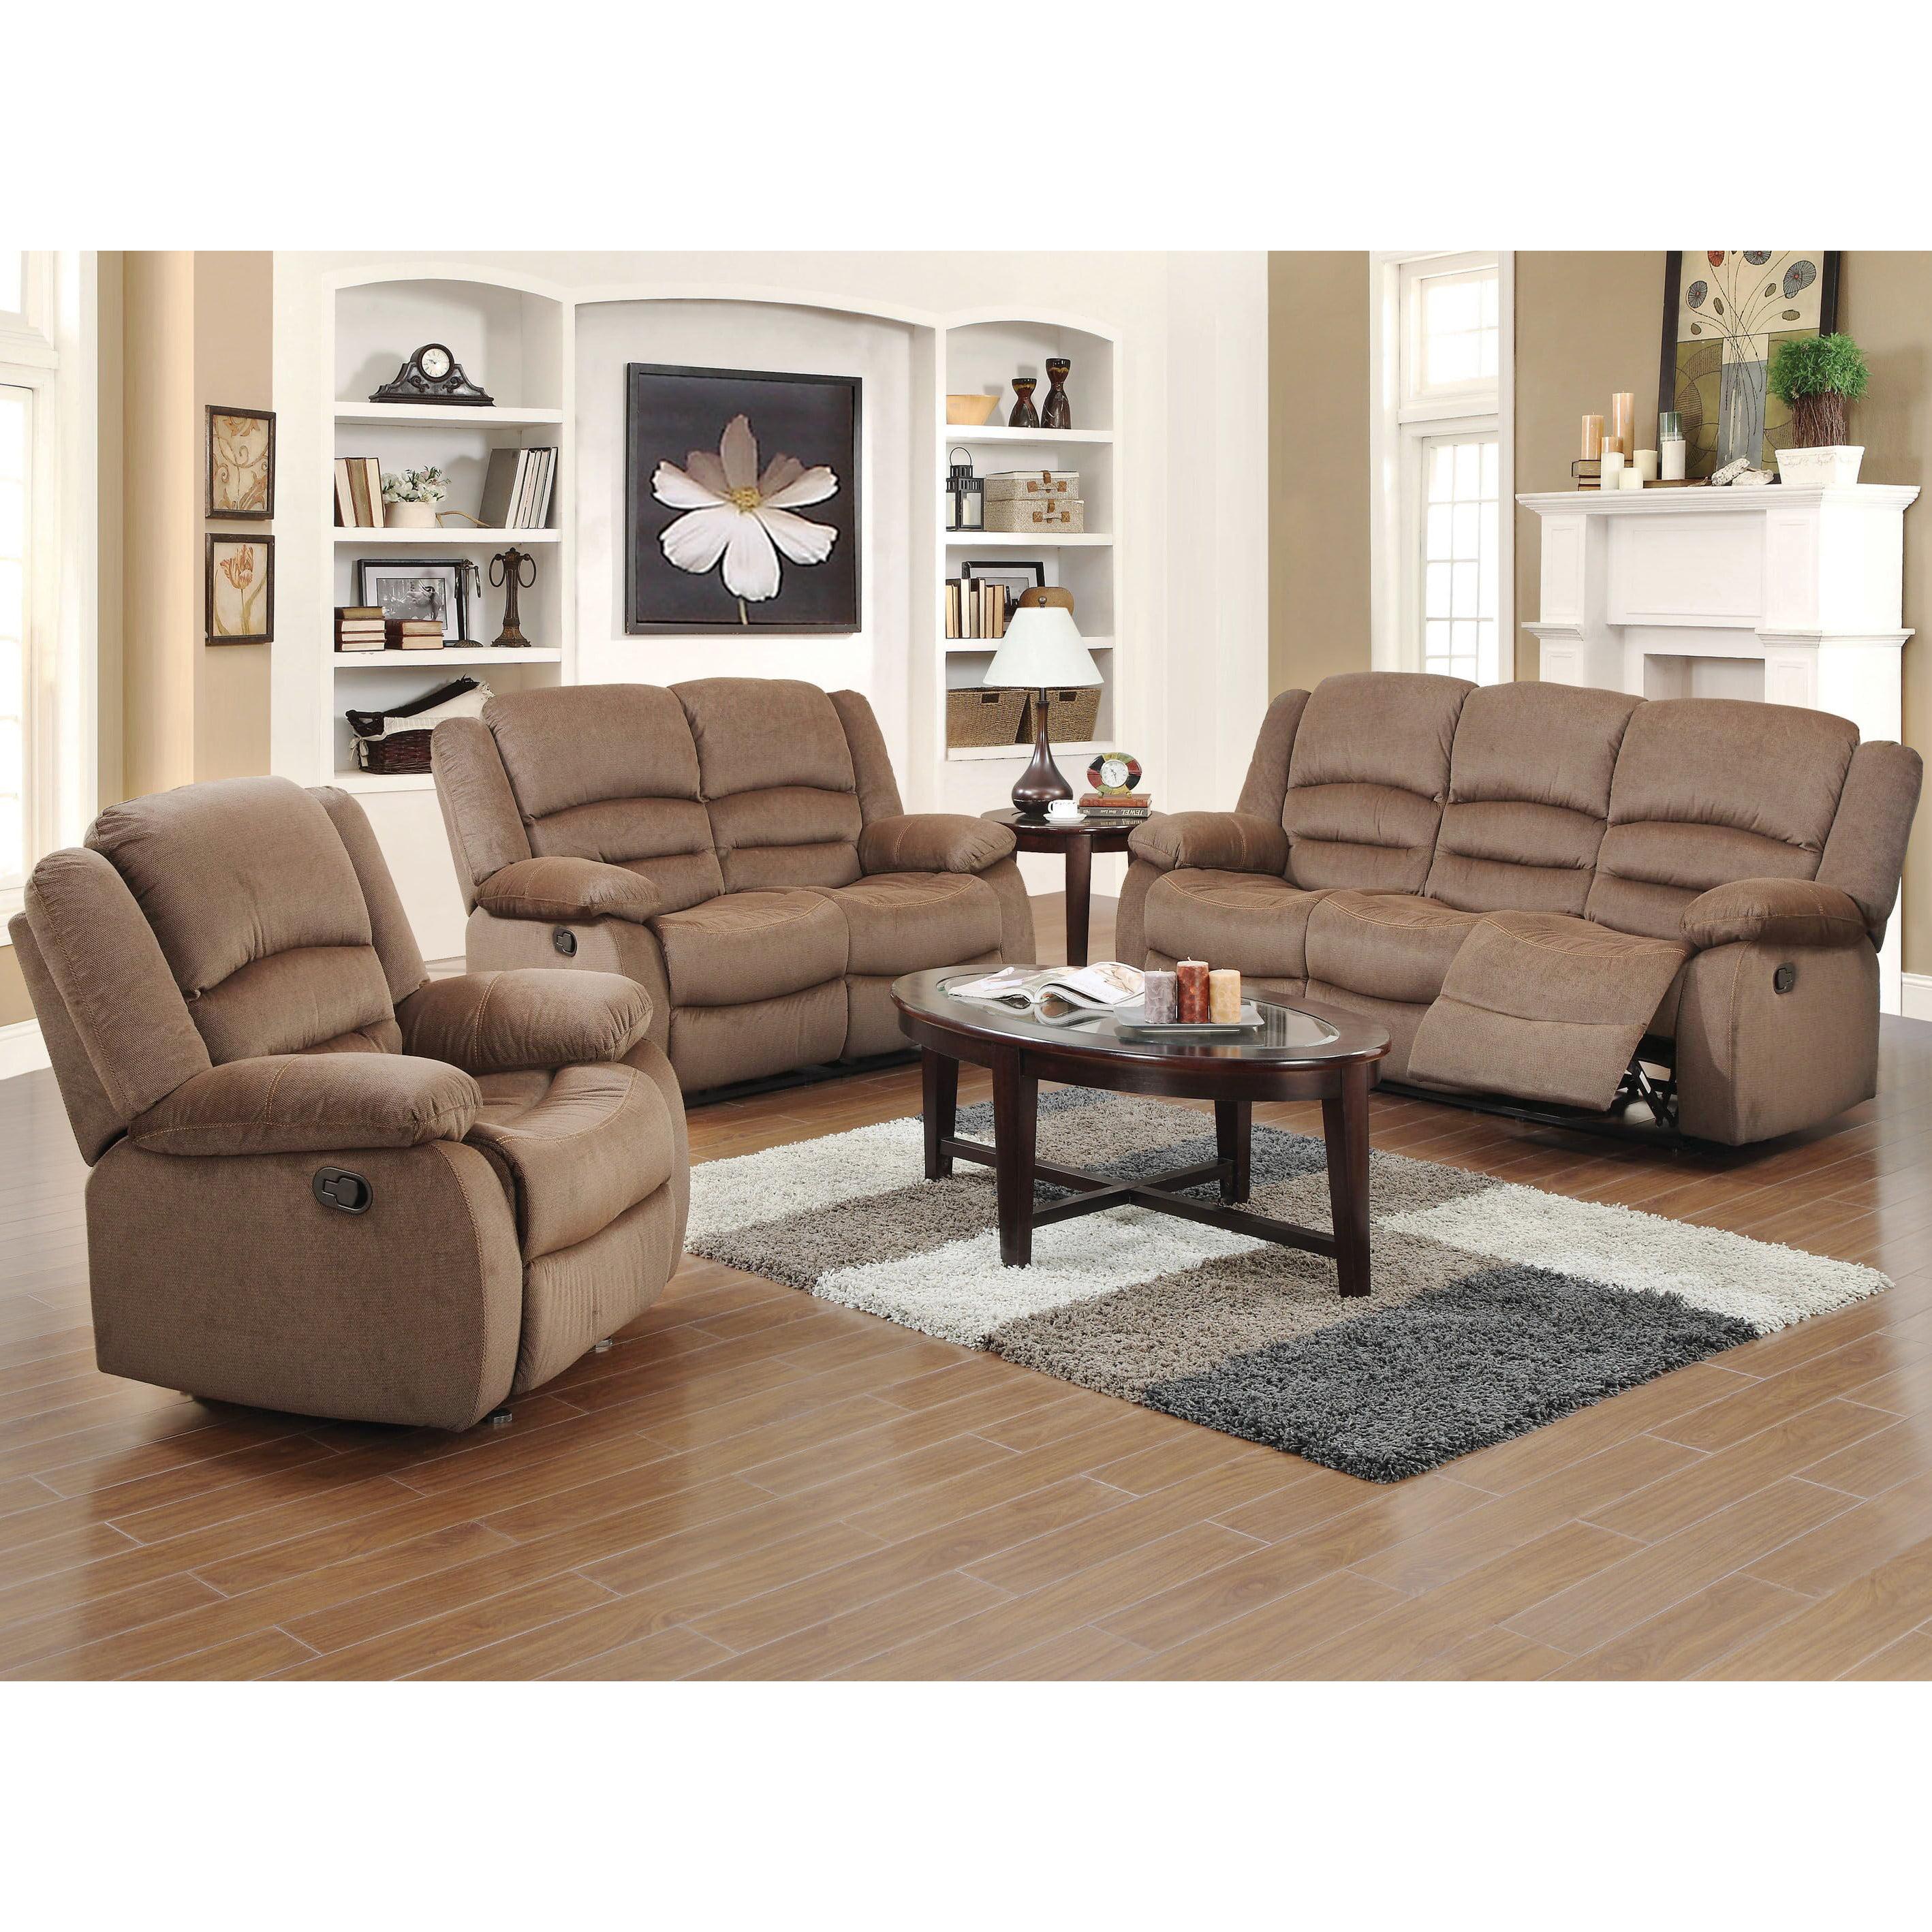 US Pride Furniture Dallas Contemporary 3-piece Fabric Reclining Sofa Set, Light Brown, S6023-3PC